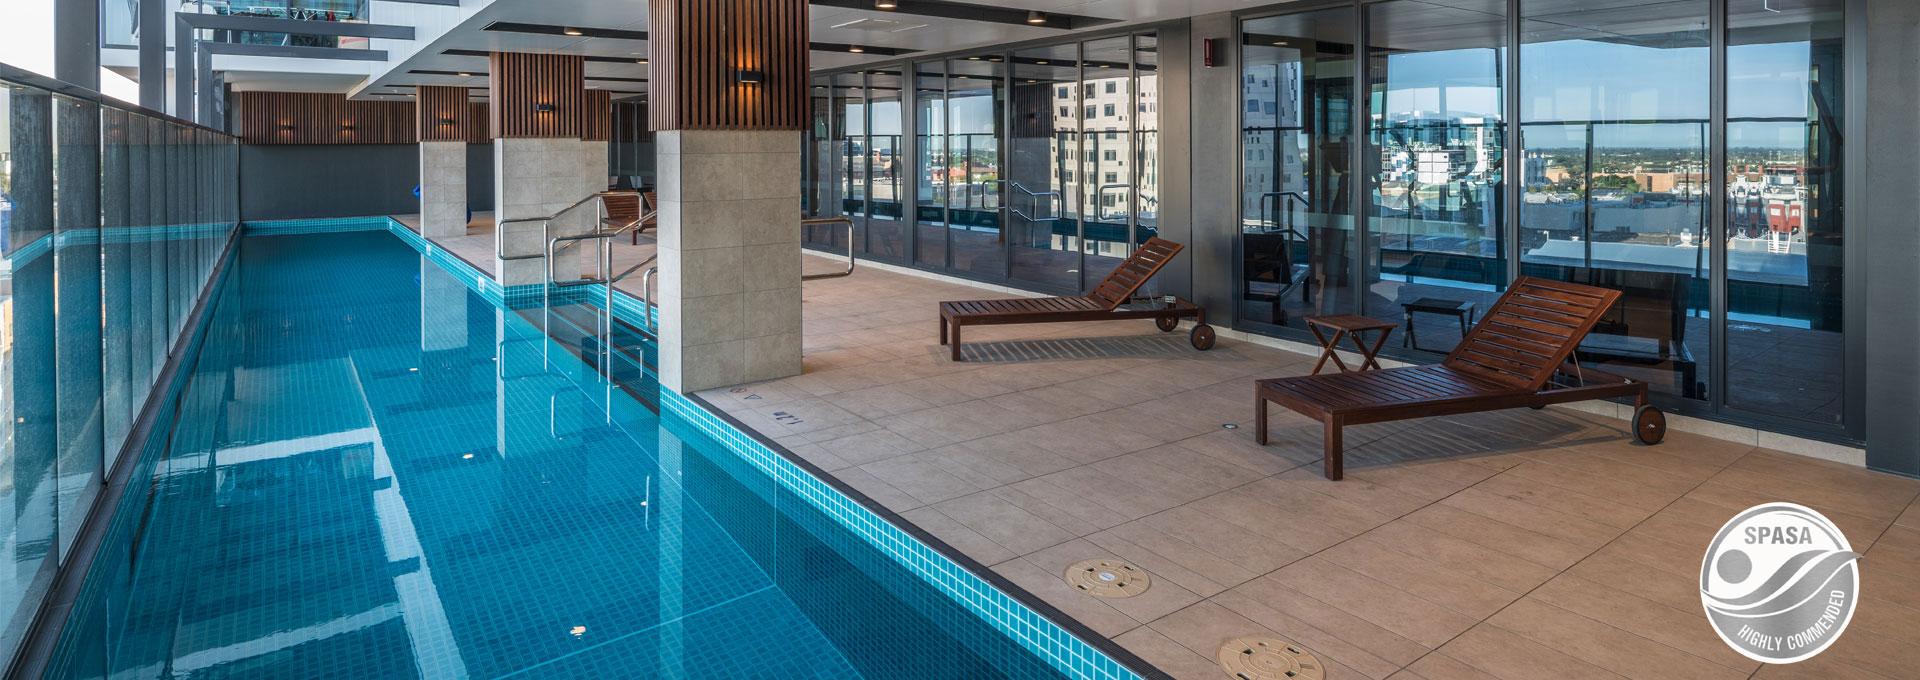 lap pool with underwater windows